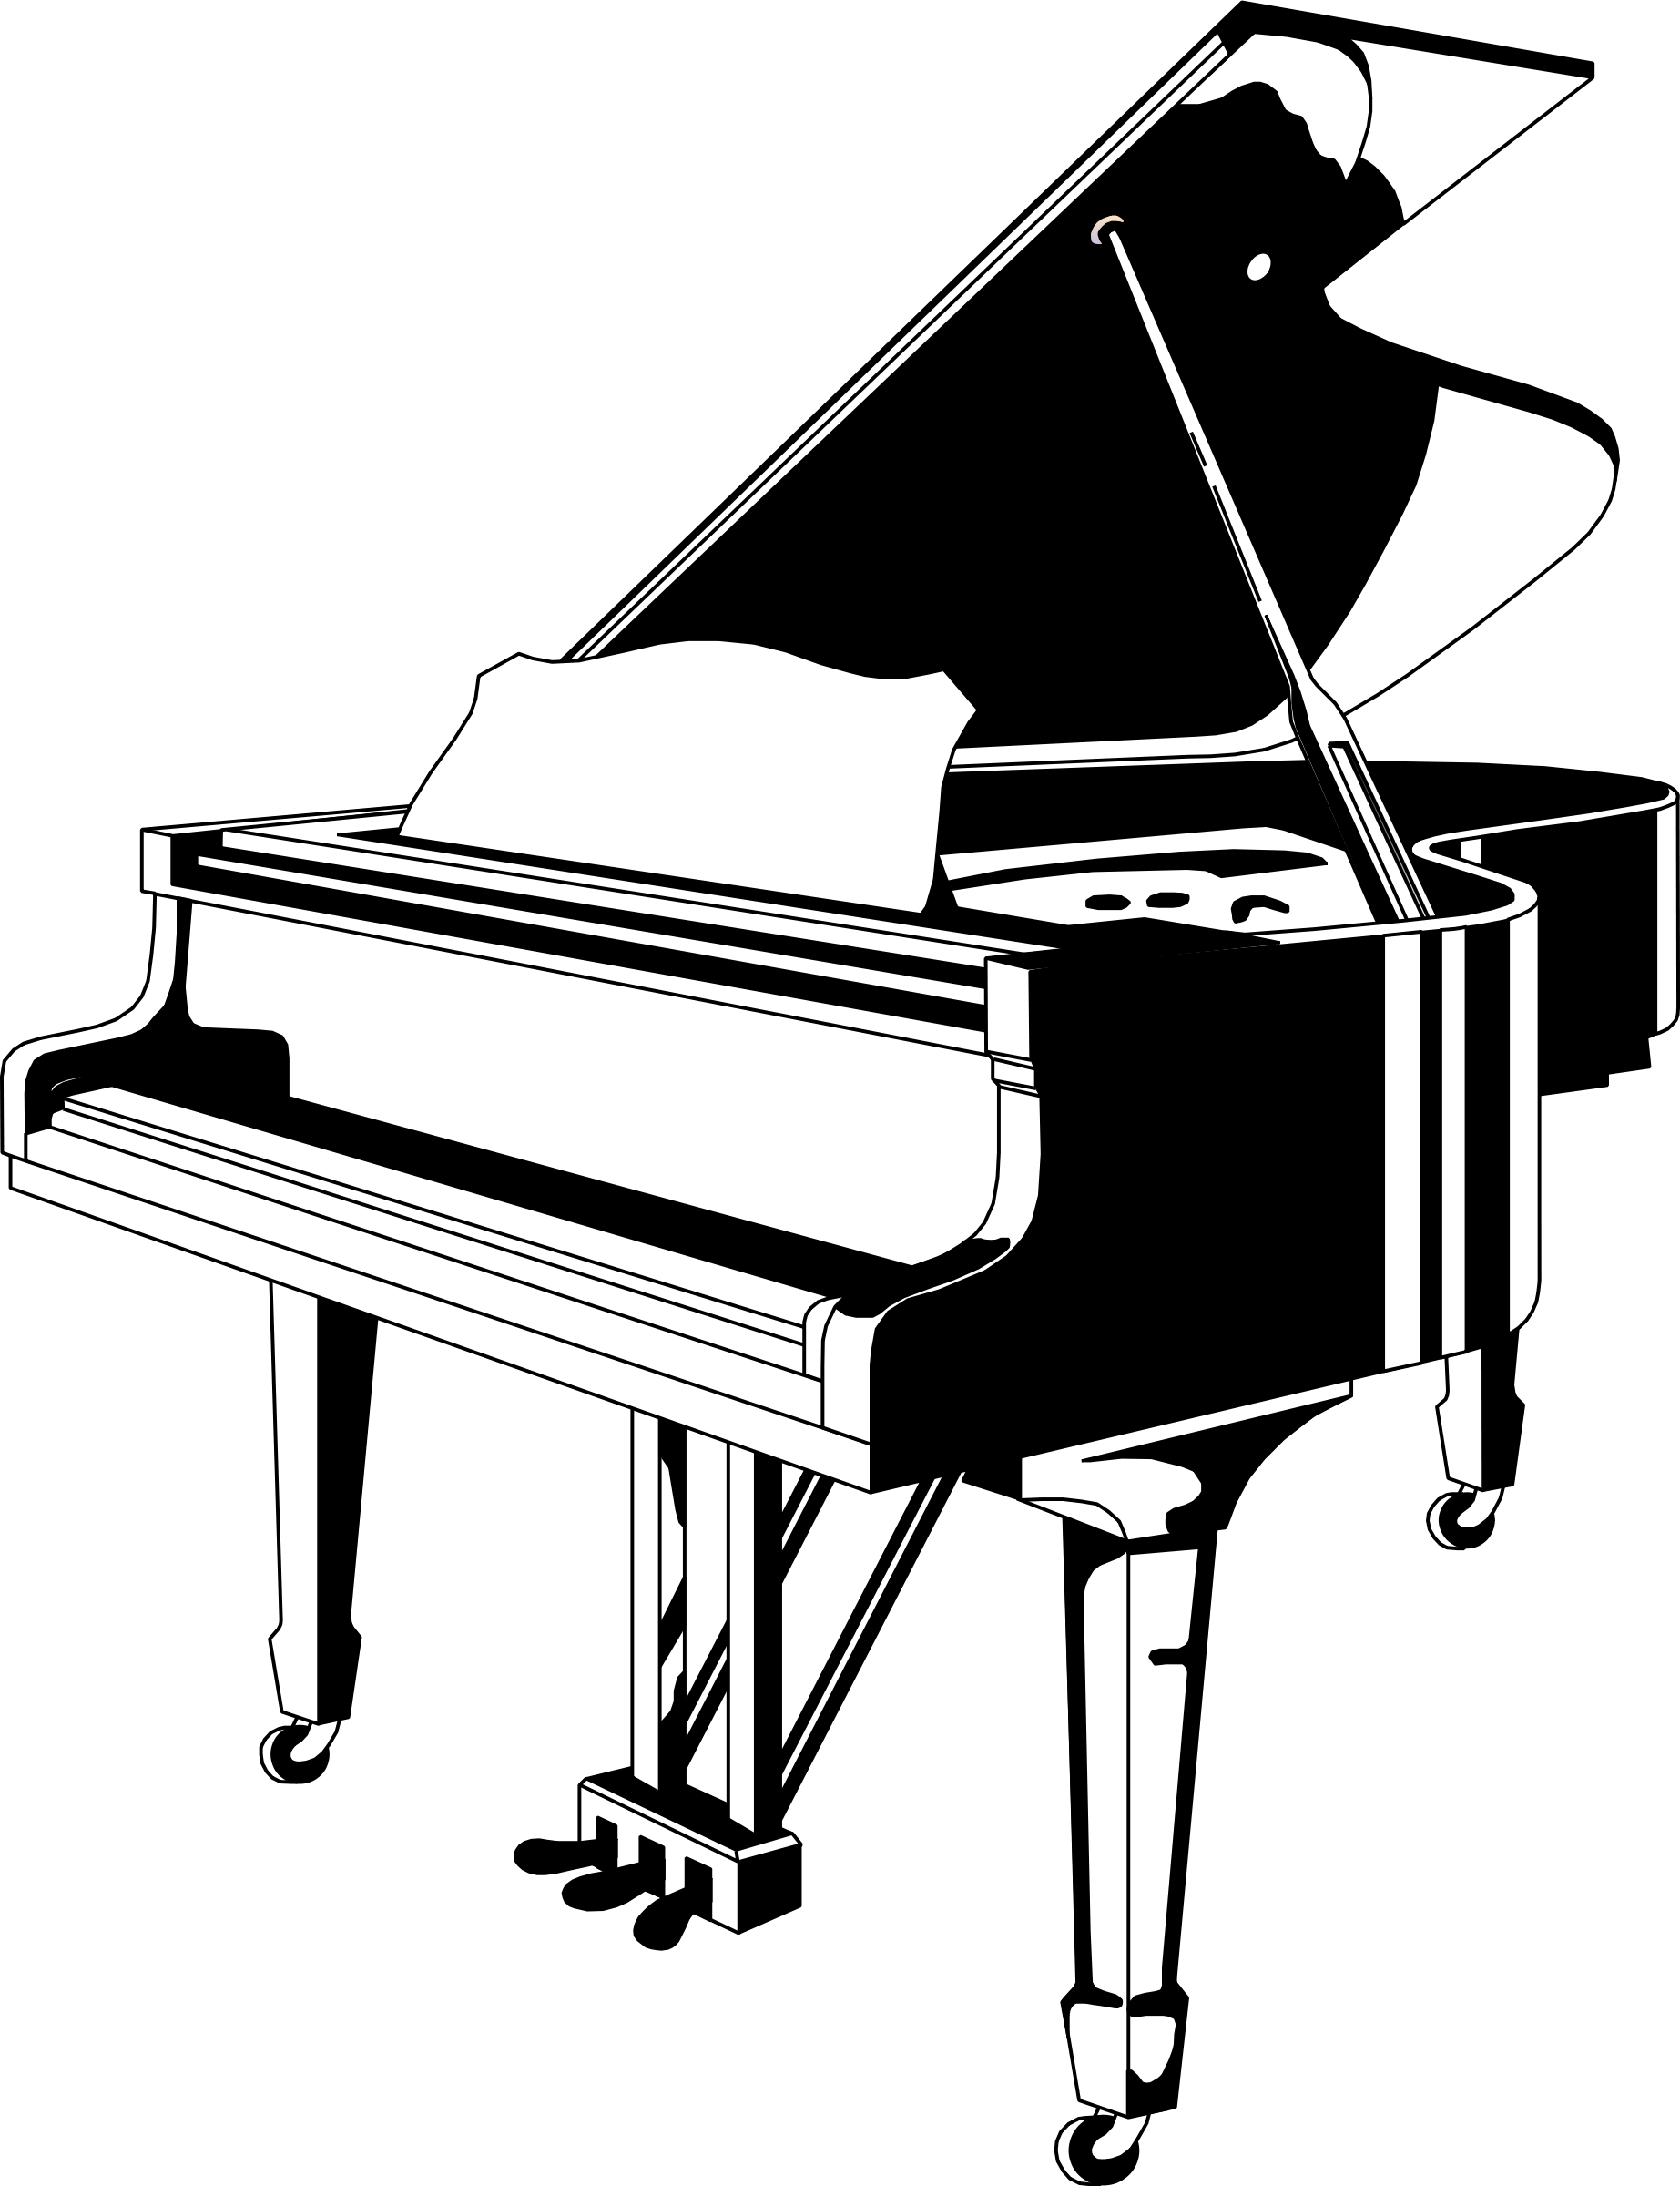 Organs clipart upright piano Clipart Panda Free Clipart Free